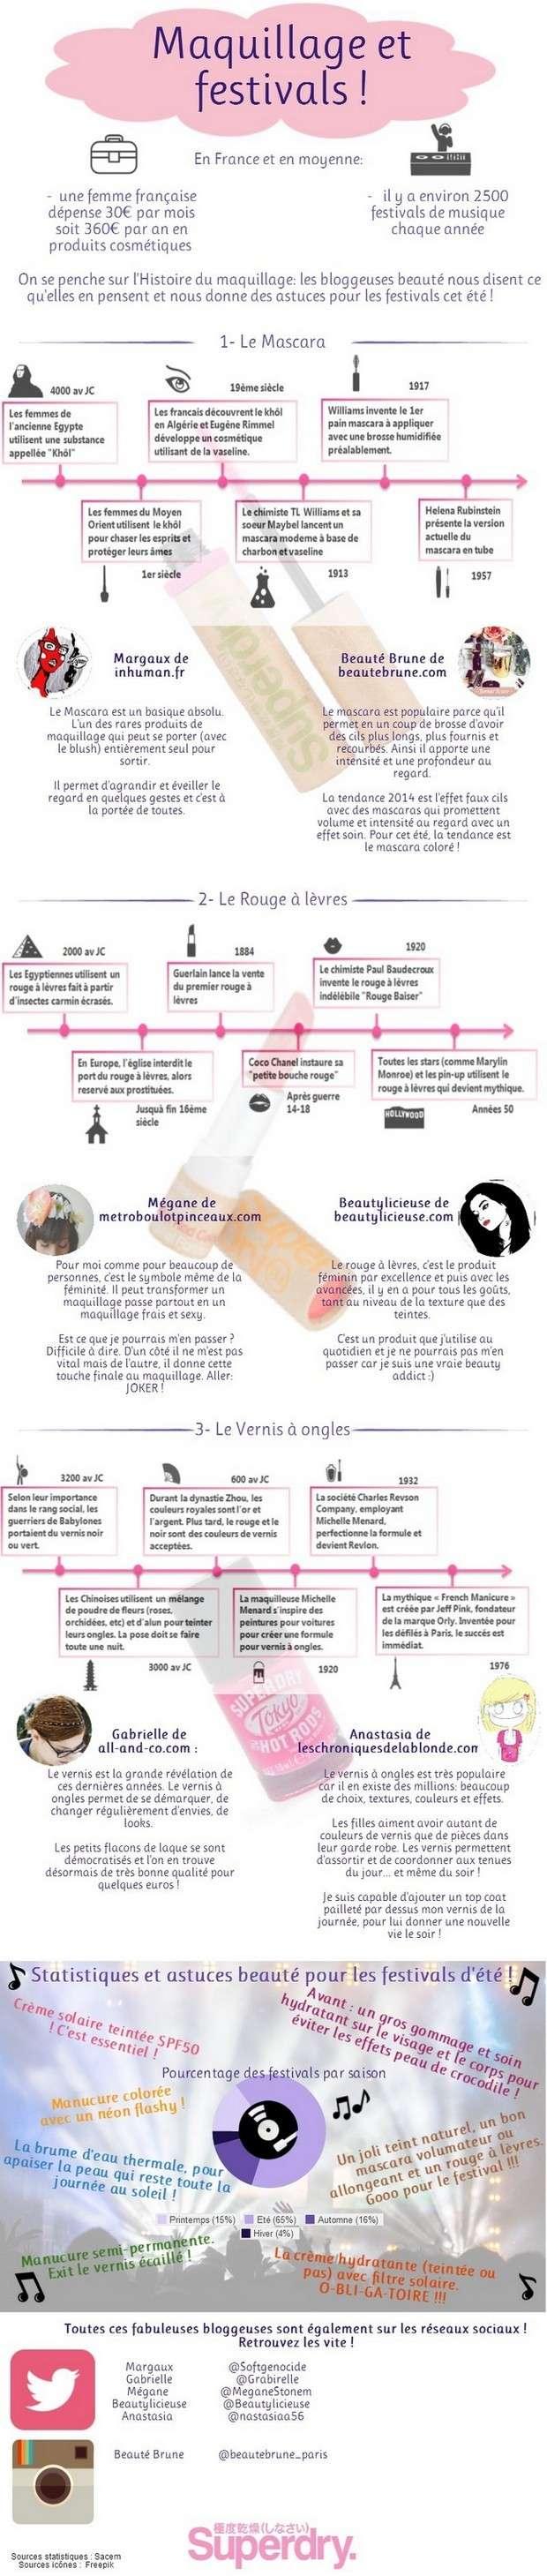 Maquillage et Festivals FR_2